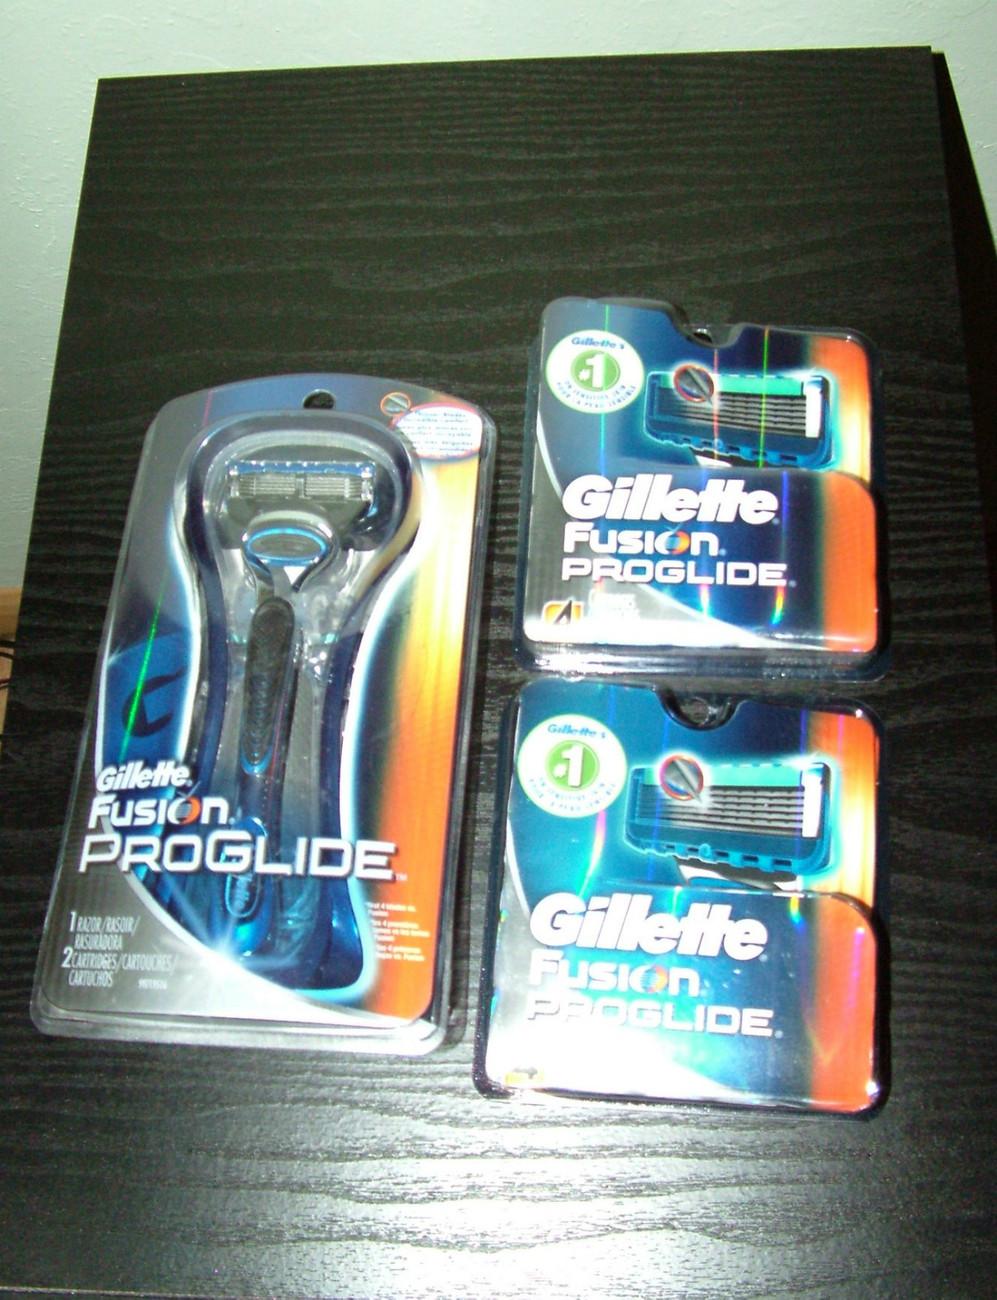 Gillette Fusion Proglide Razor Kitmanual And 31 Similar Items Manual T2ec16h Yue9s6ng 9brmo7zgsjq 60 57